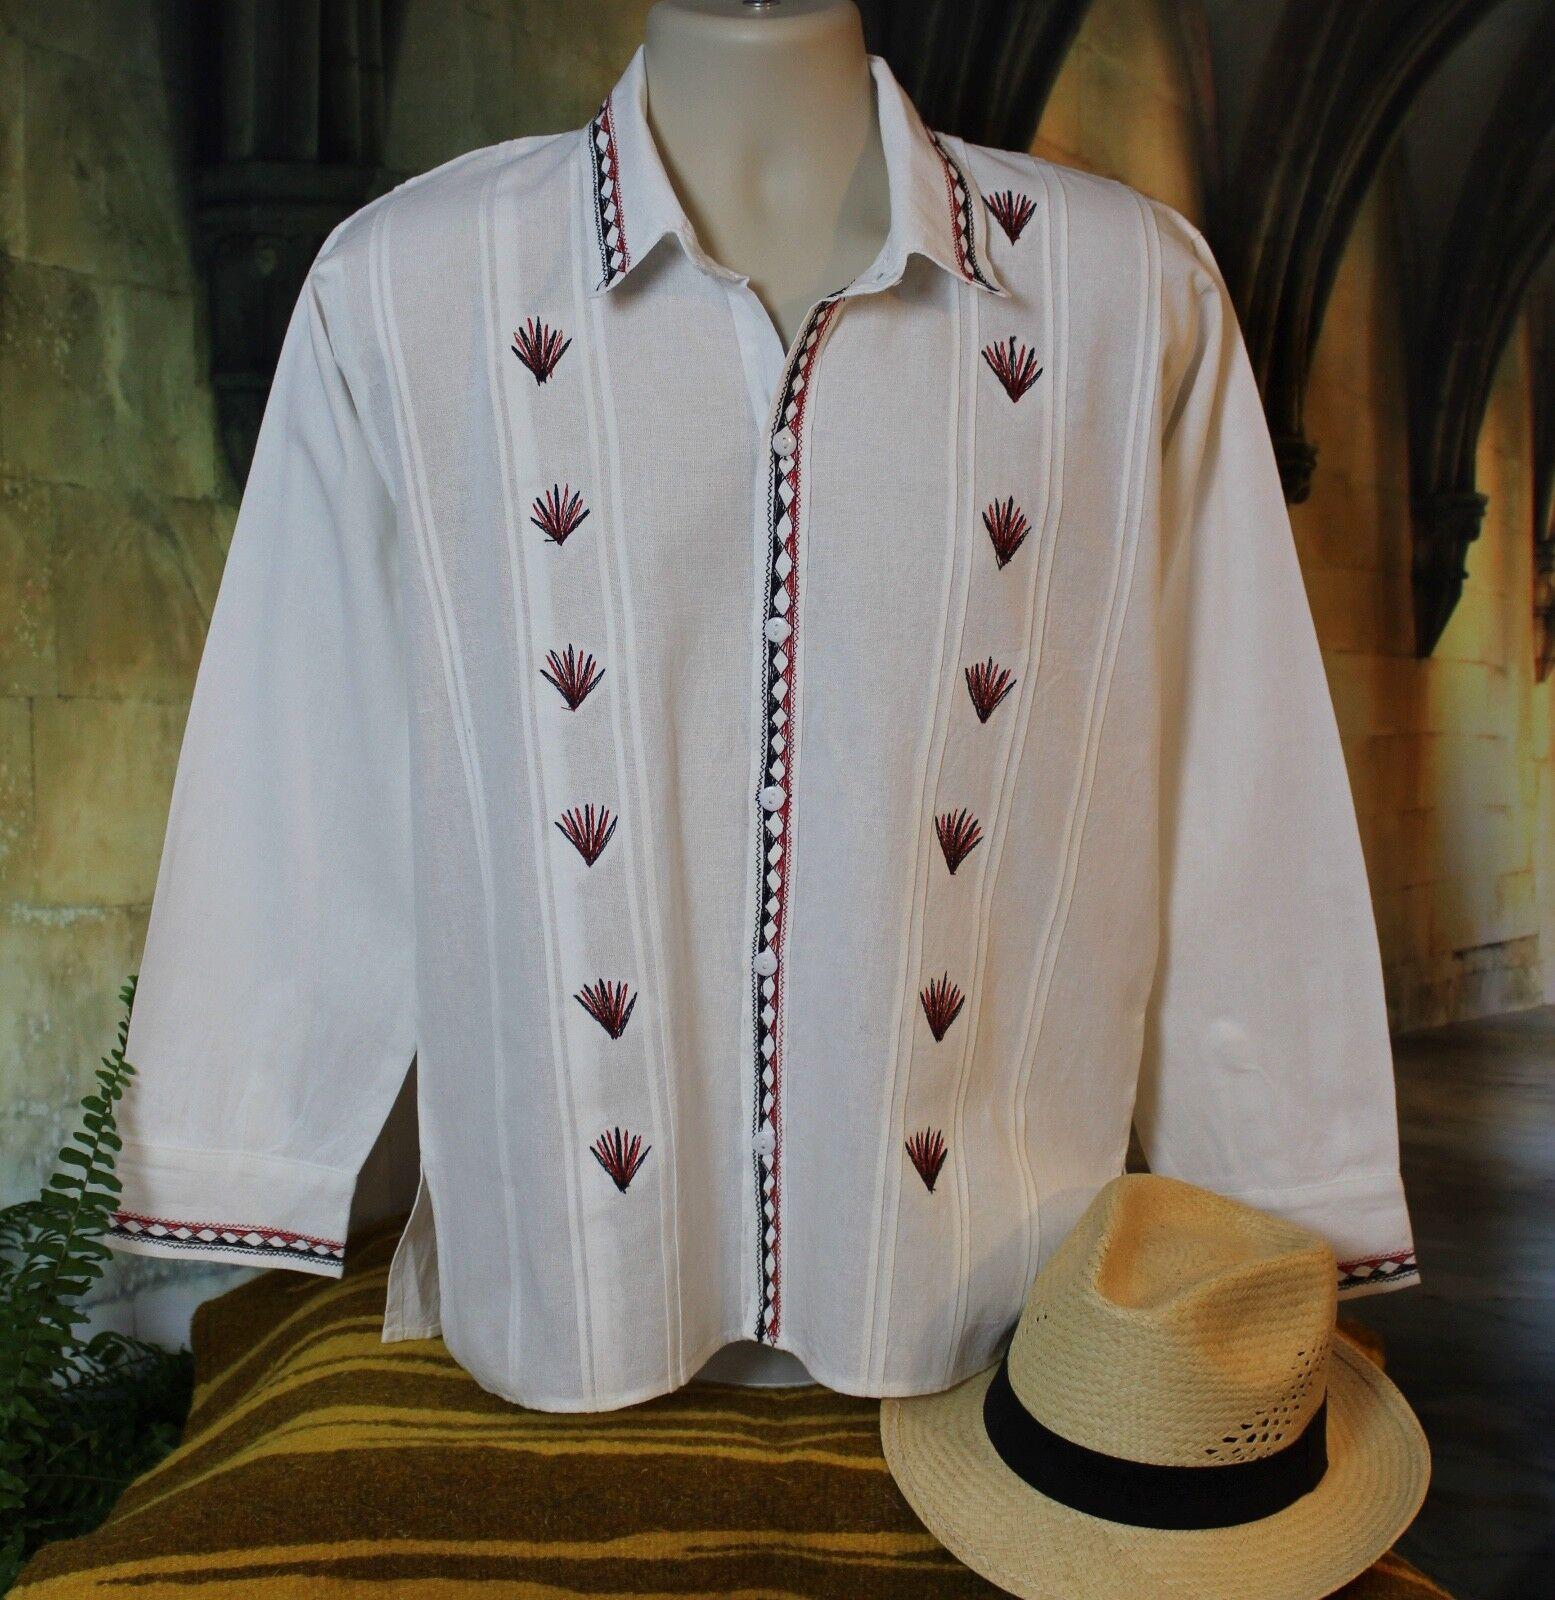 Men's Guayabera Latin American Shirt Camisa Agave Tequila Tlahuitoltepec Mexico